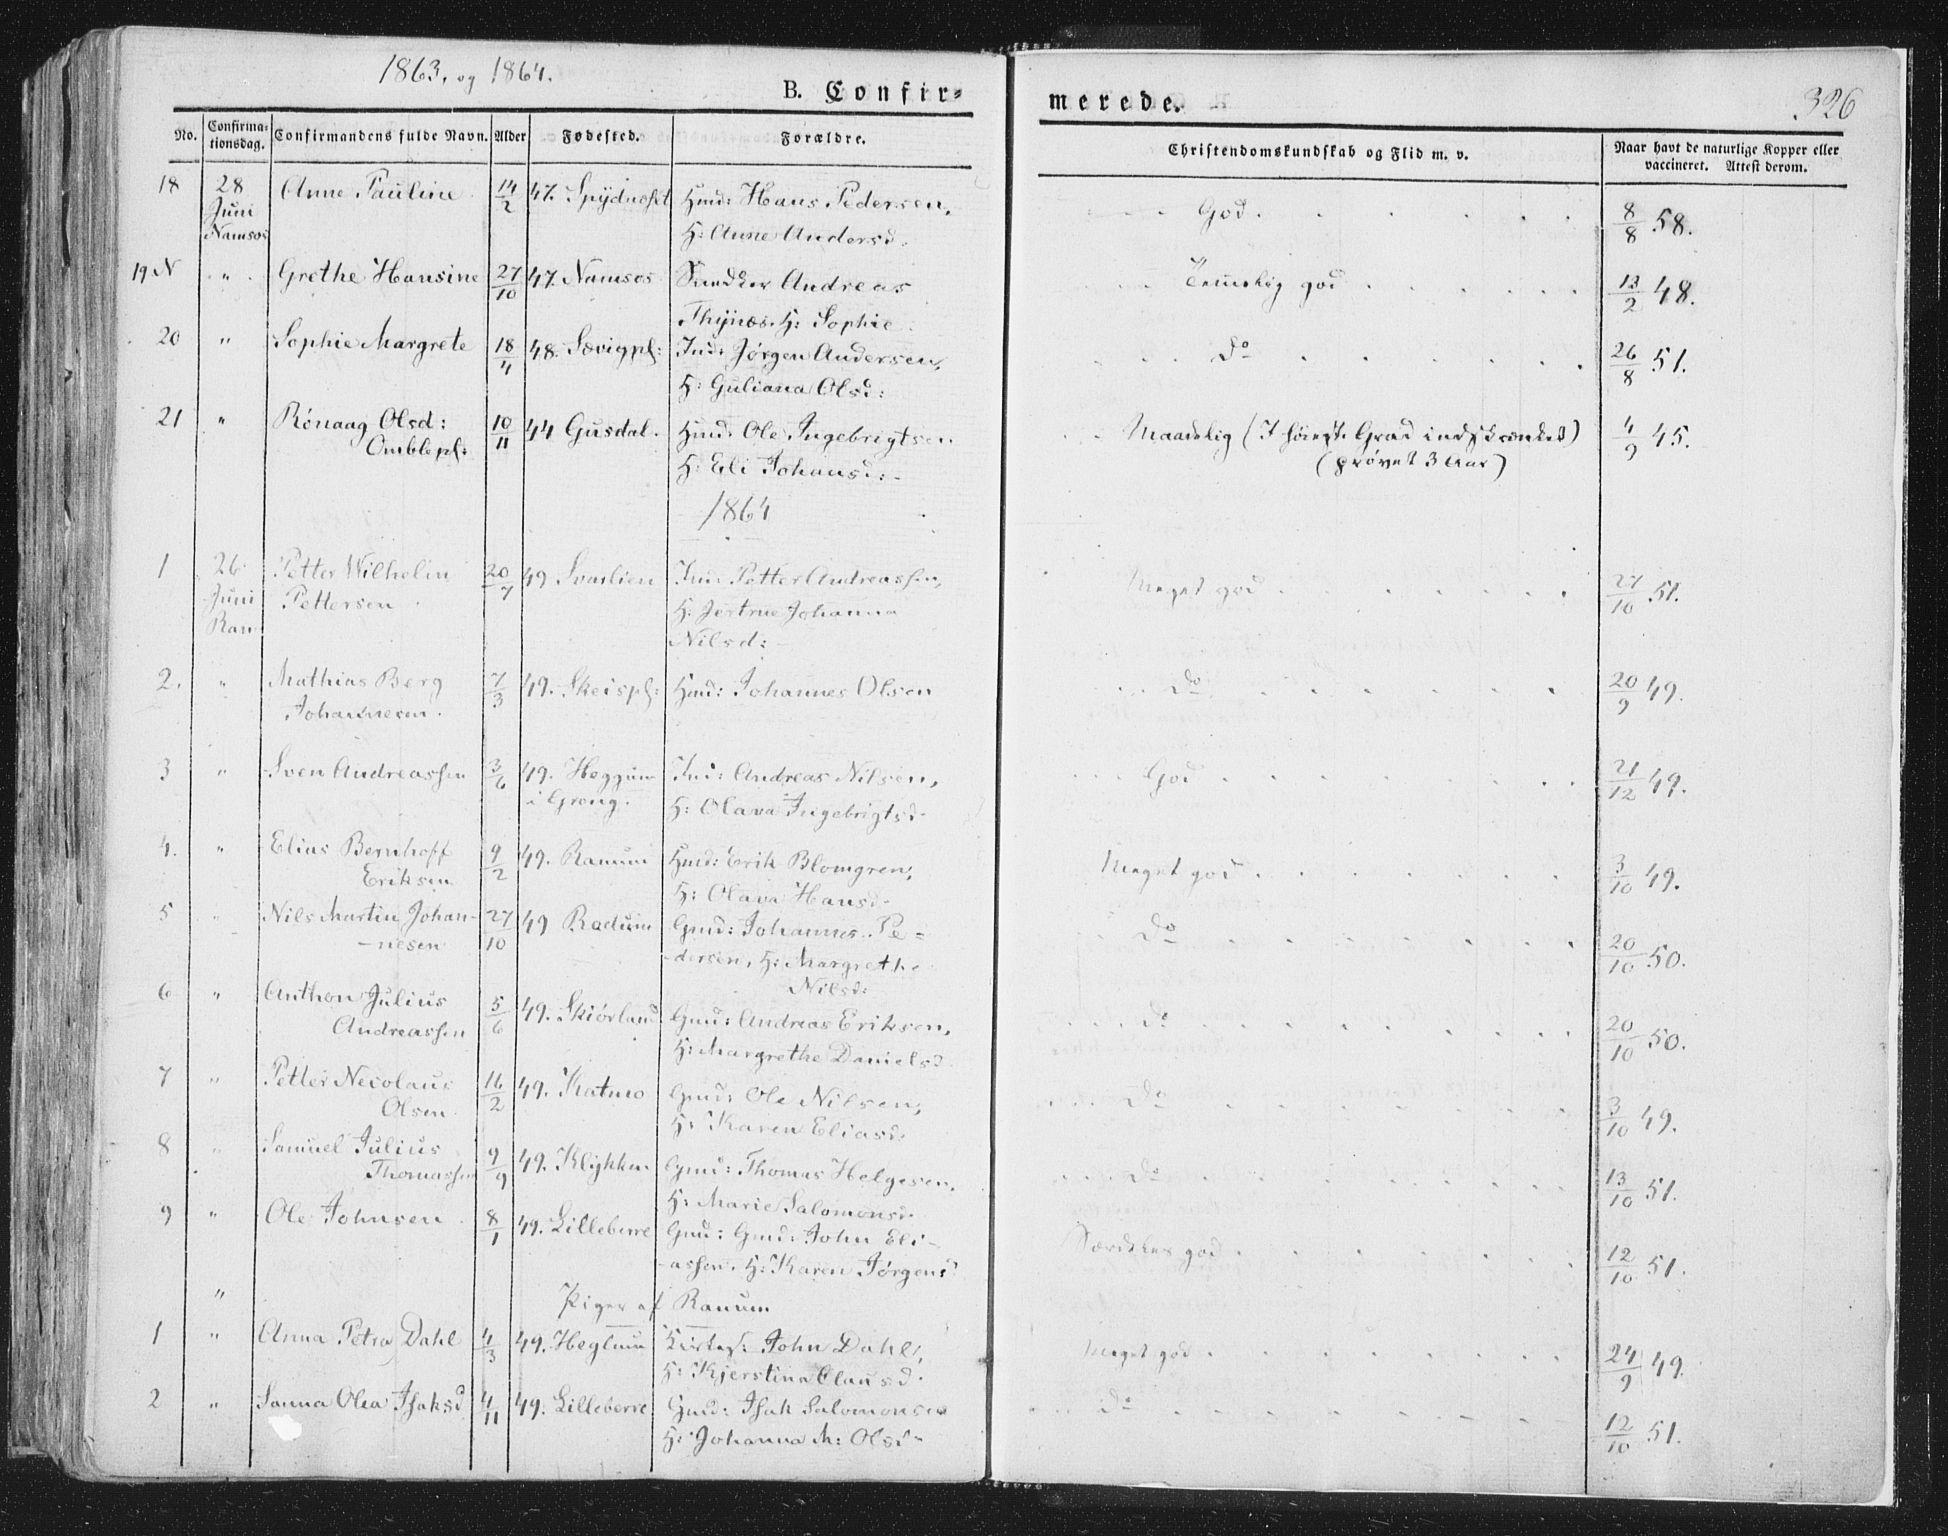 SAT, Ministerialprotokoller, klokkerbøker og fødselsregistre - Nord-Trøndelag, 764/L0551: Ministerialbok nr. 764A07a, 1824-1864, s. 326